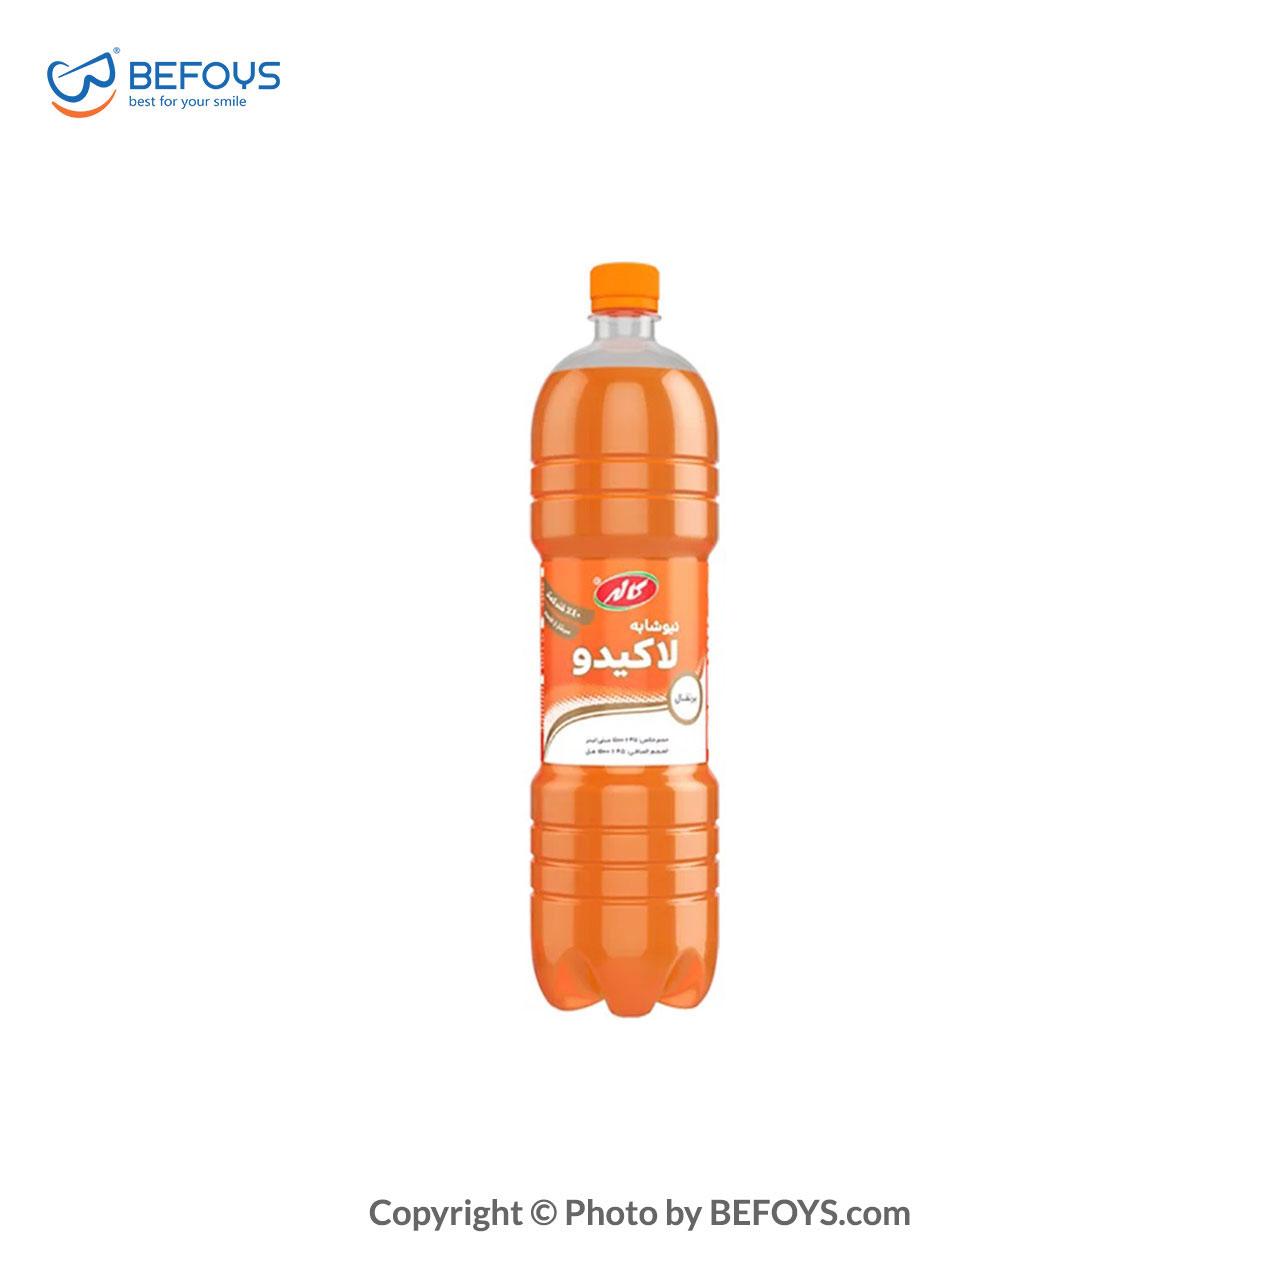 نیوشابه لاکیدو پرتقال 1.5 لیتری